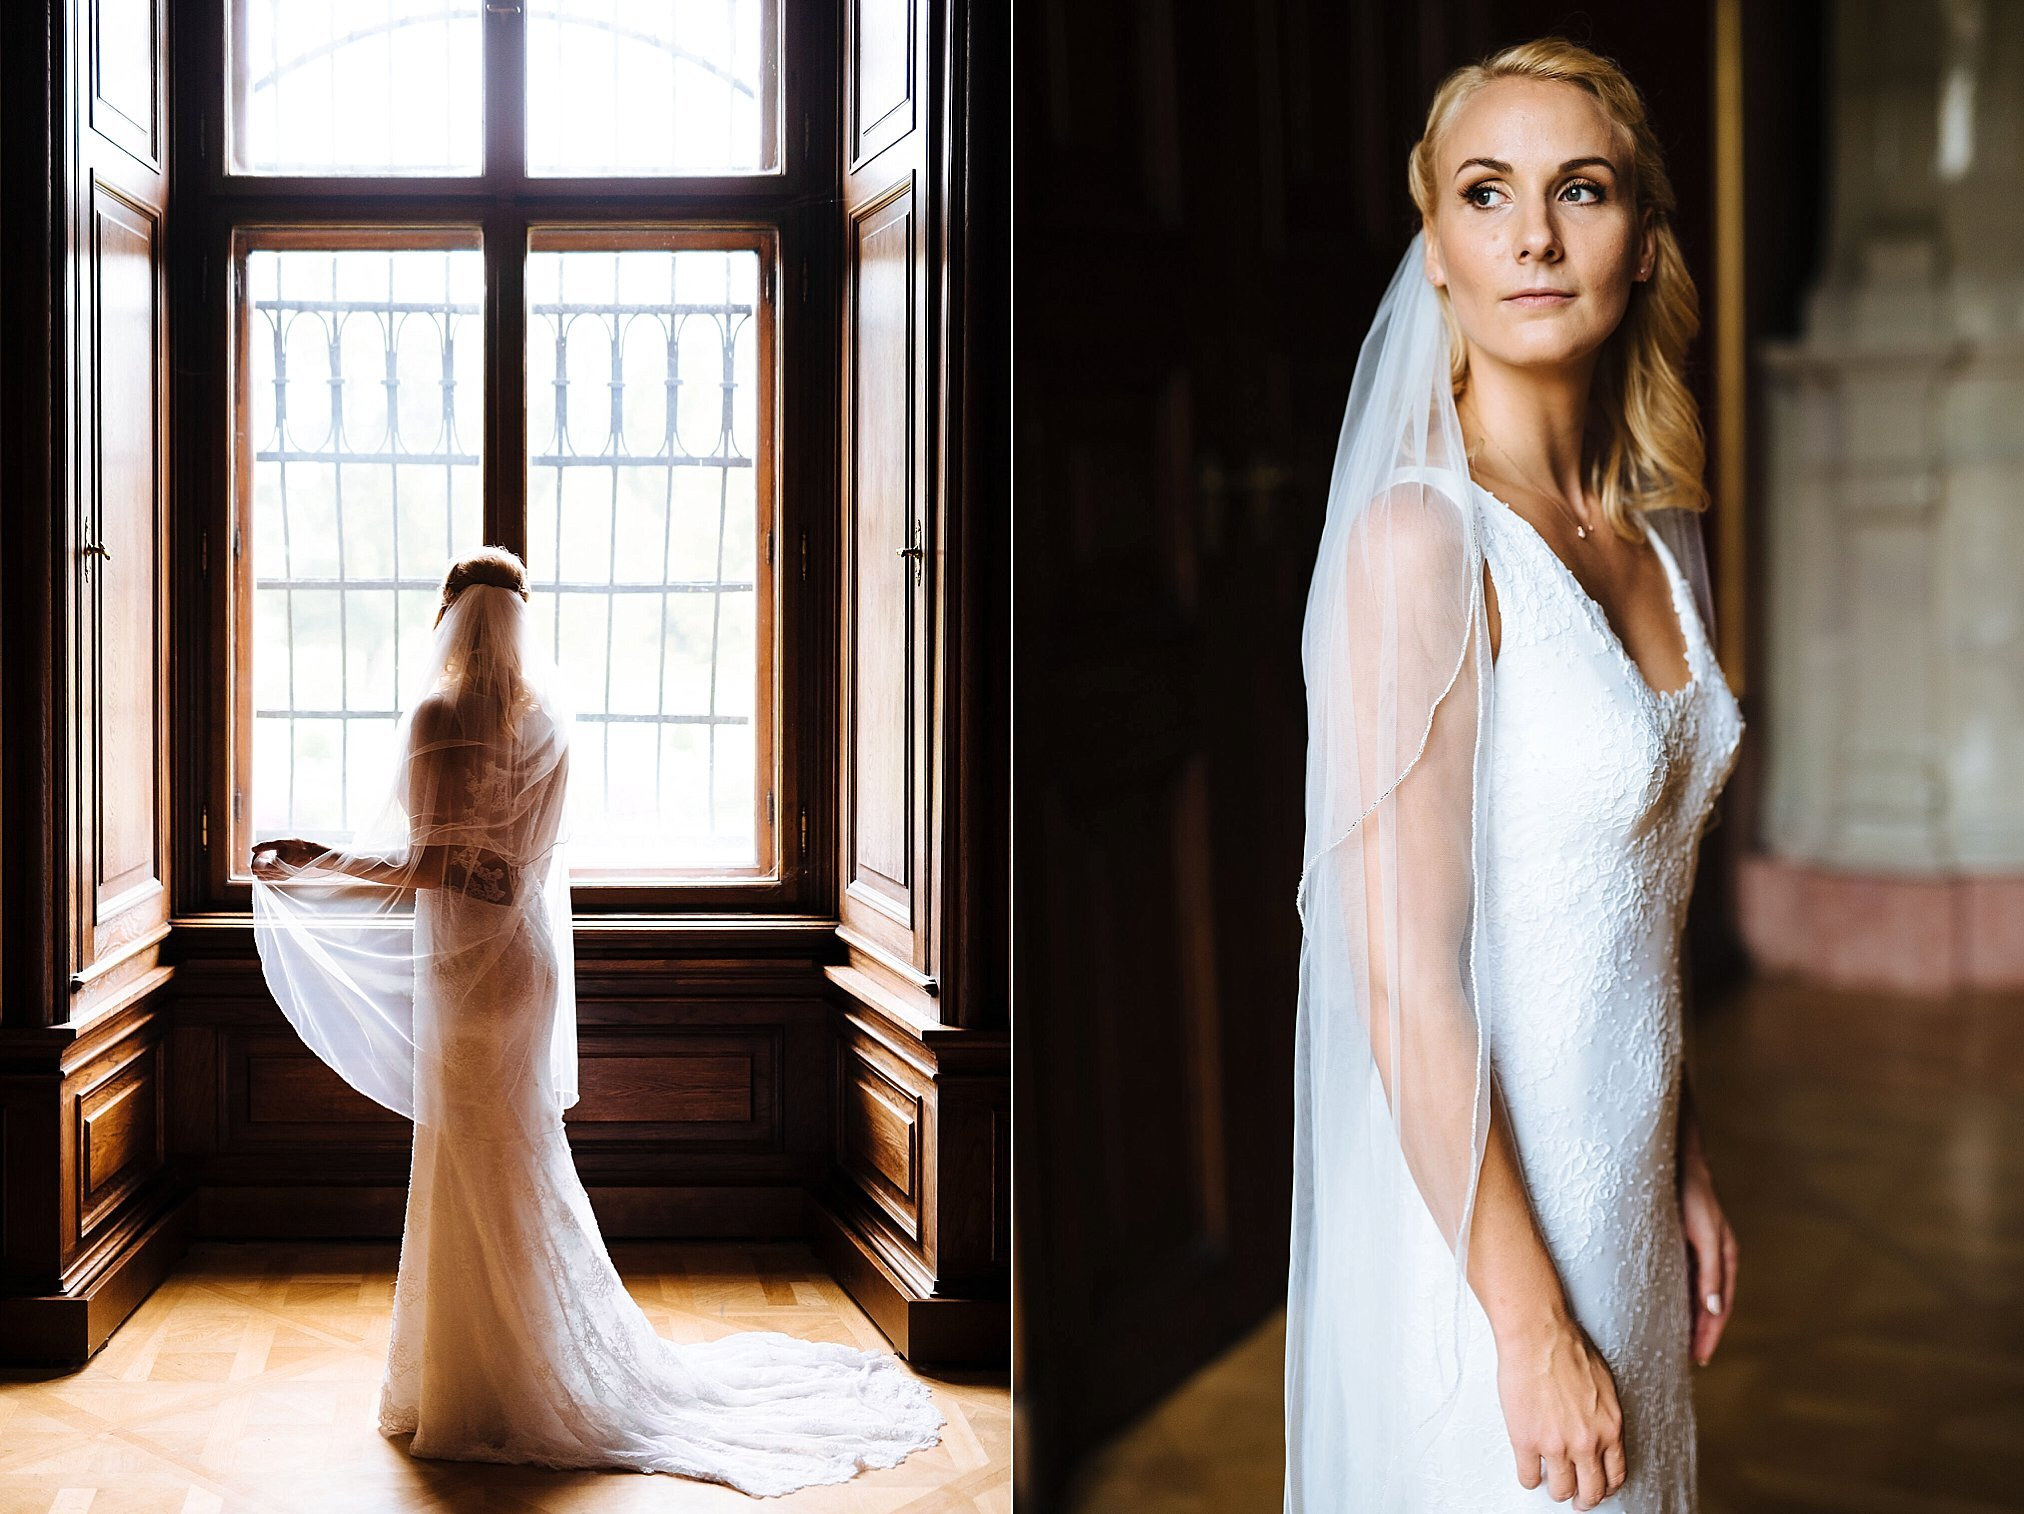 Hochzeit-Shloss-Grafenegg_0109.jpg